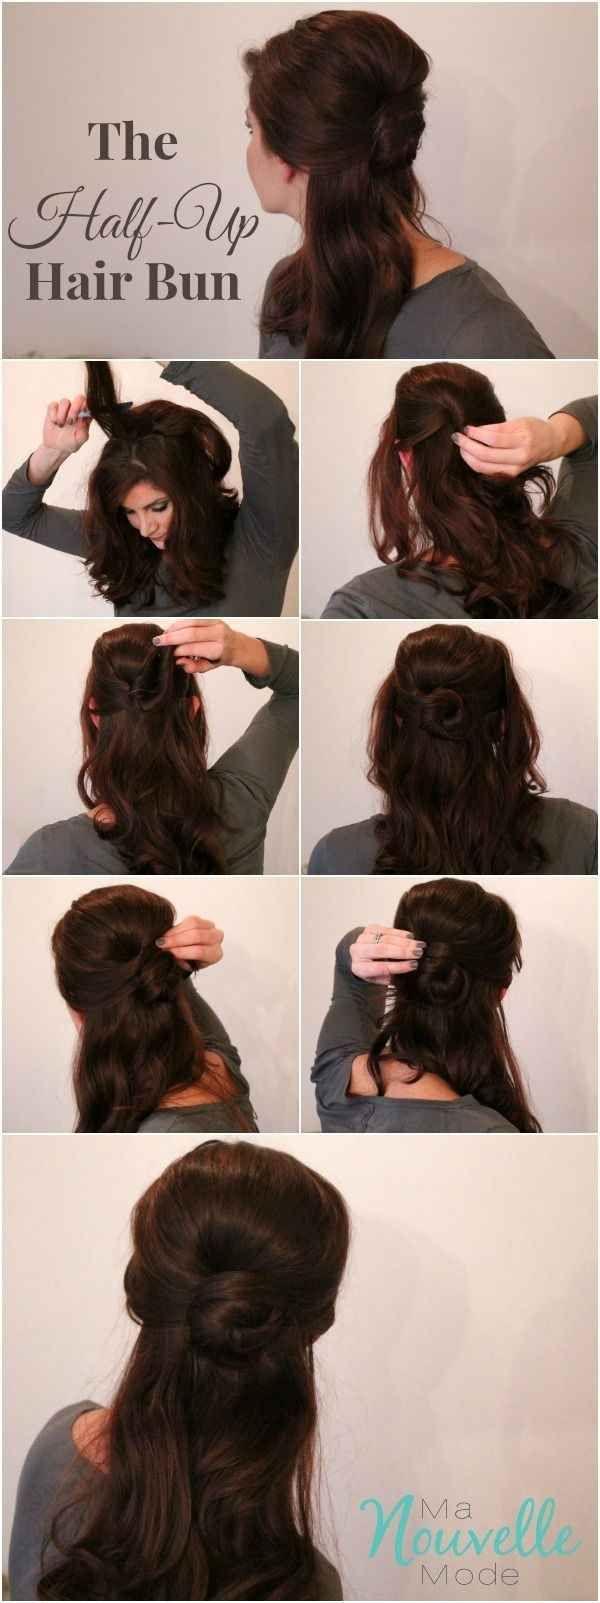 7 Easy Hair Tutorials Even Disney Princesses Would Envy